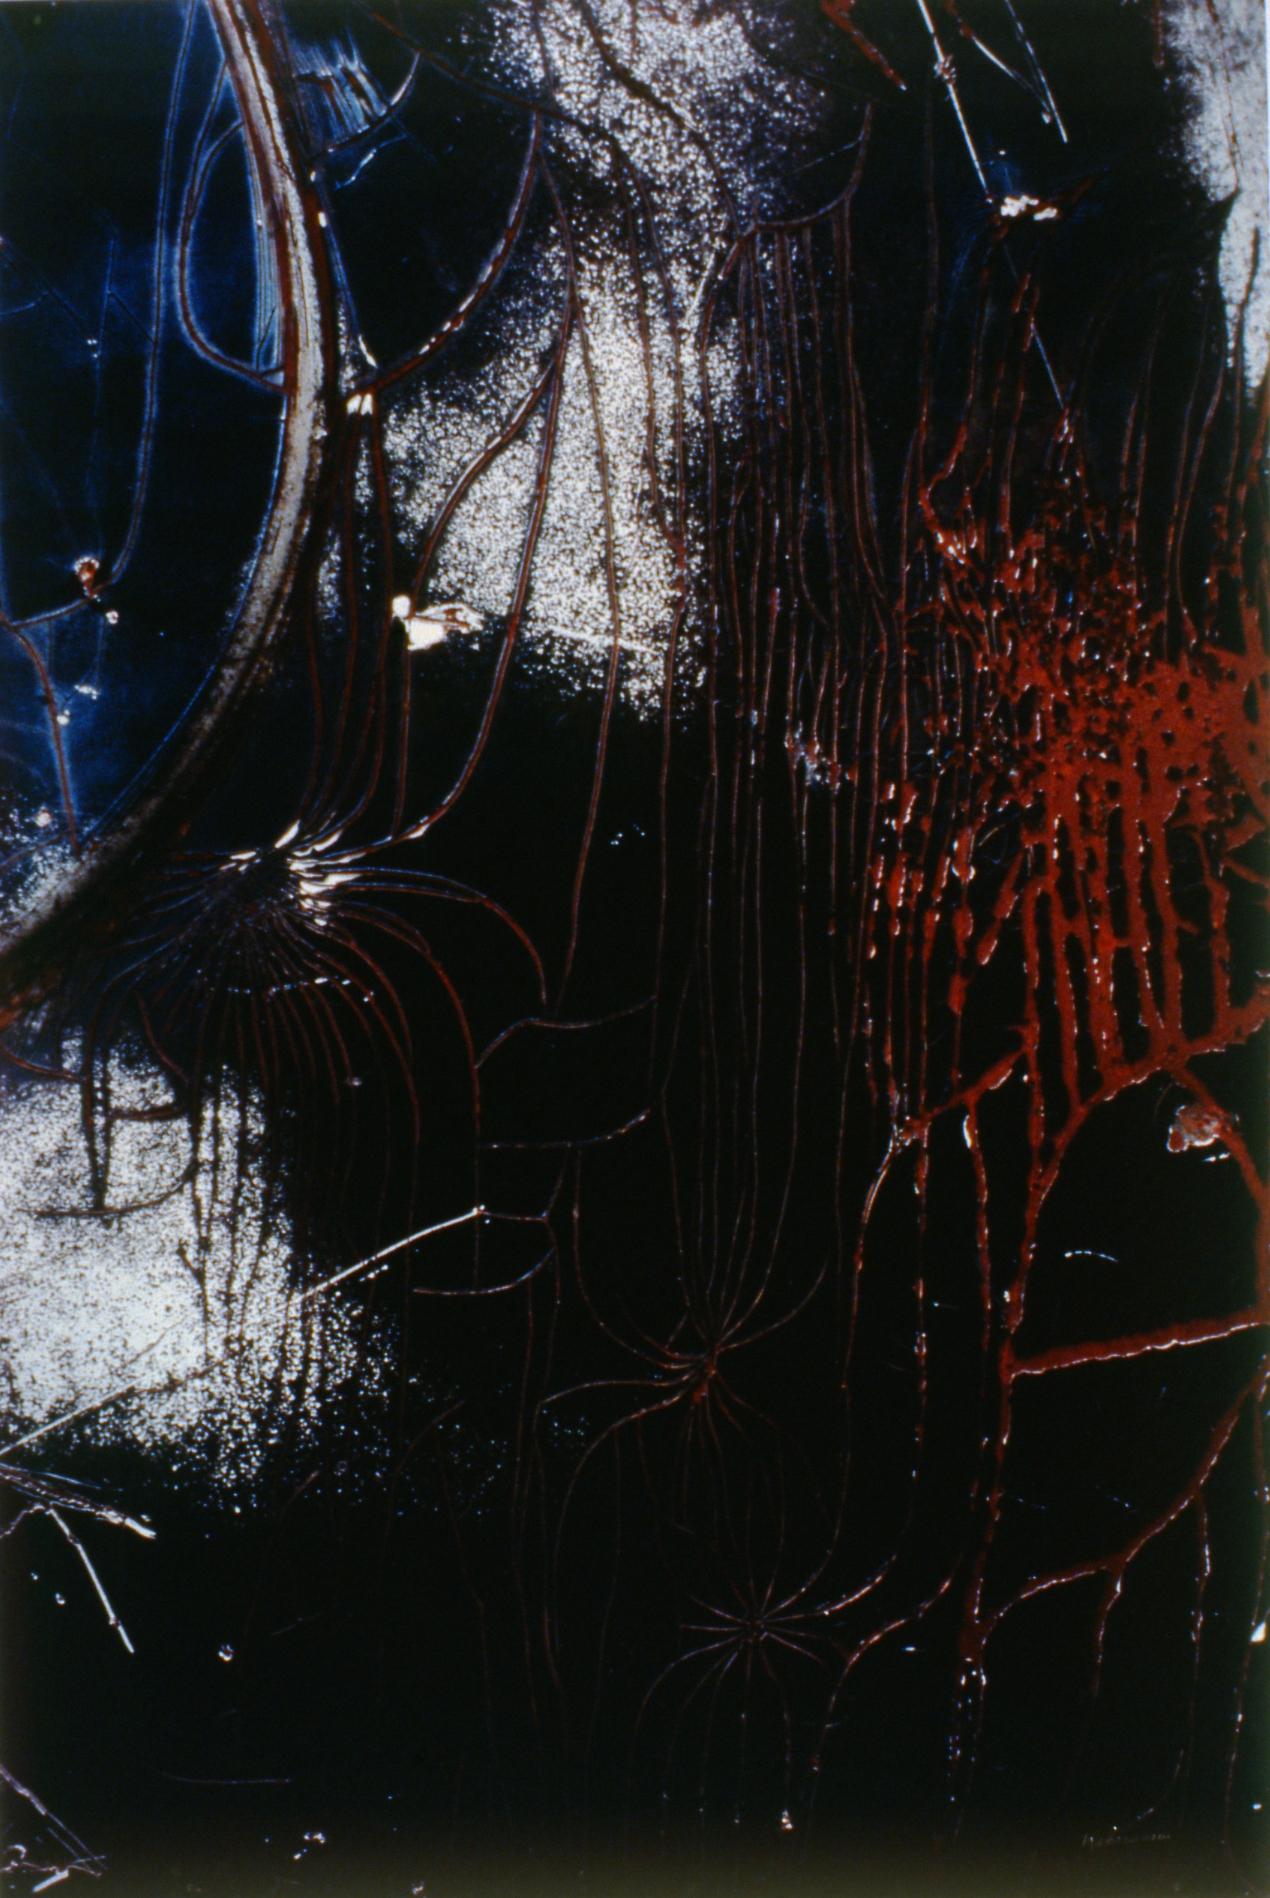 "Etchings of Time , nd. Gerhard Kahrmann, photograph, 22"" x 28"", 1994.16.01"